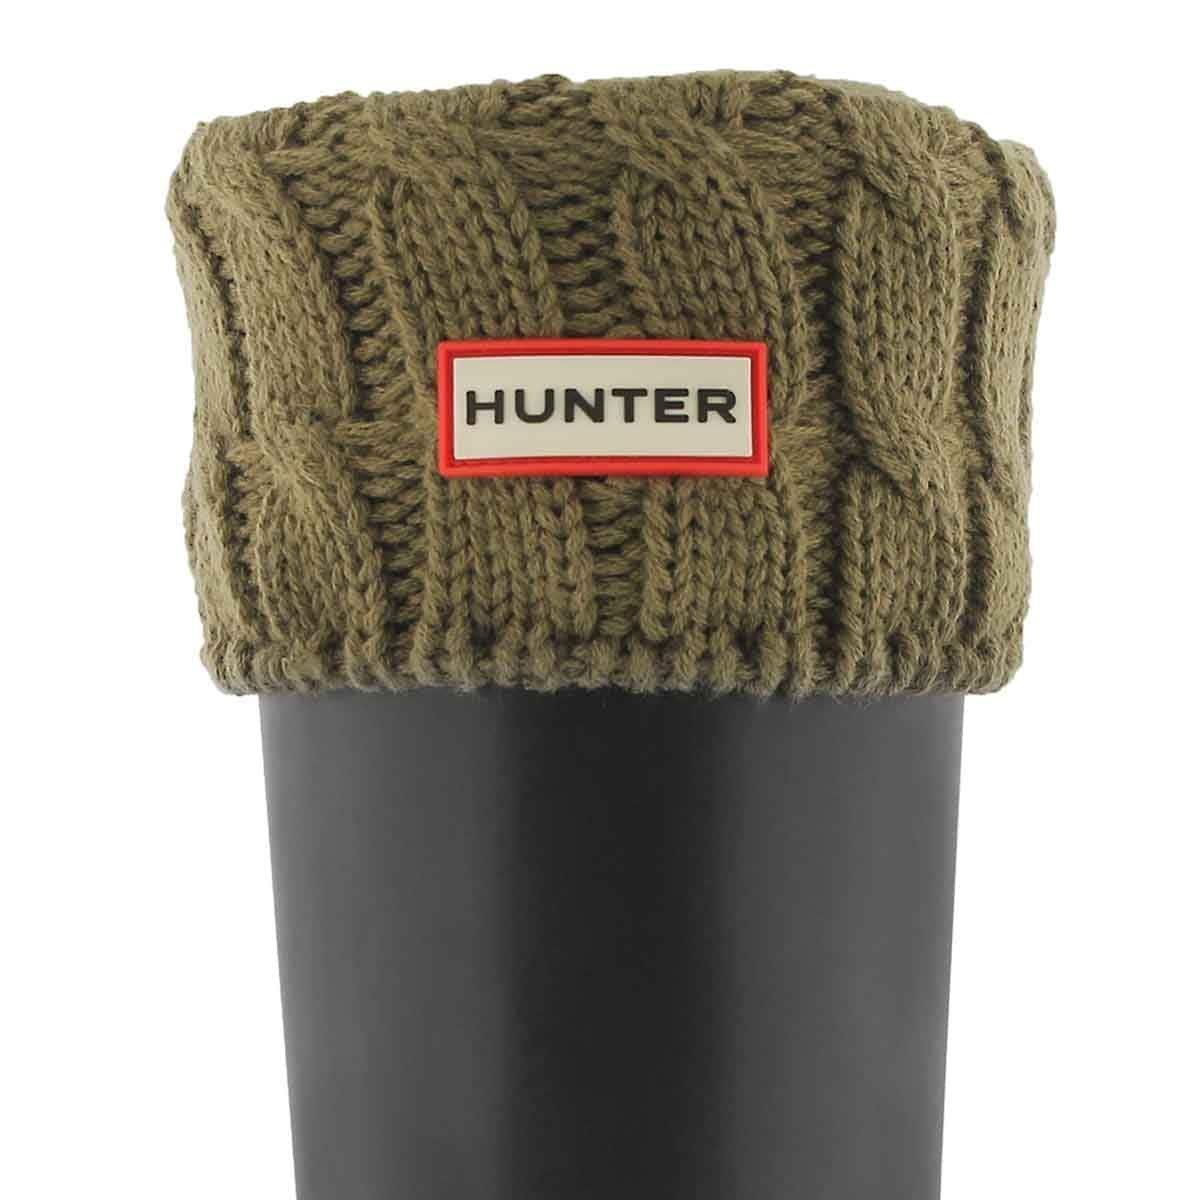 Hunter Boots Women's 6 Stitch Cable Boot Sock Khaki LG M US